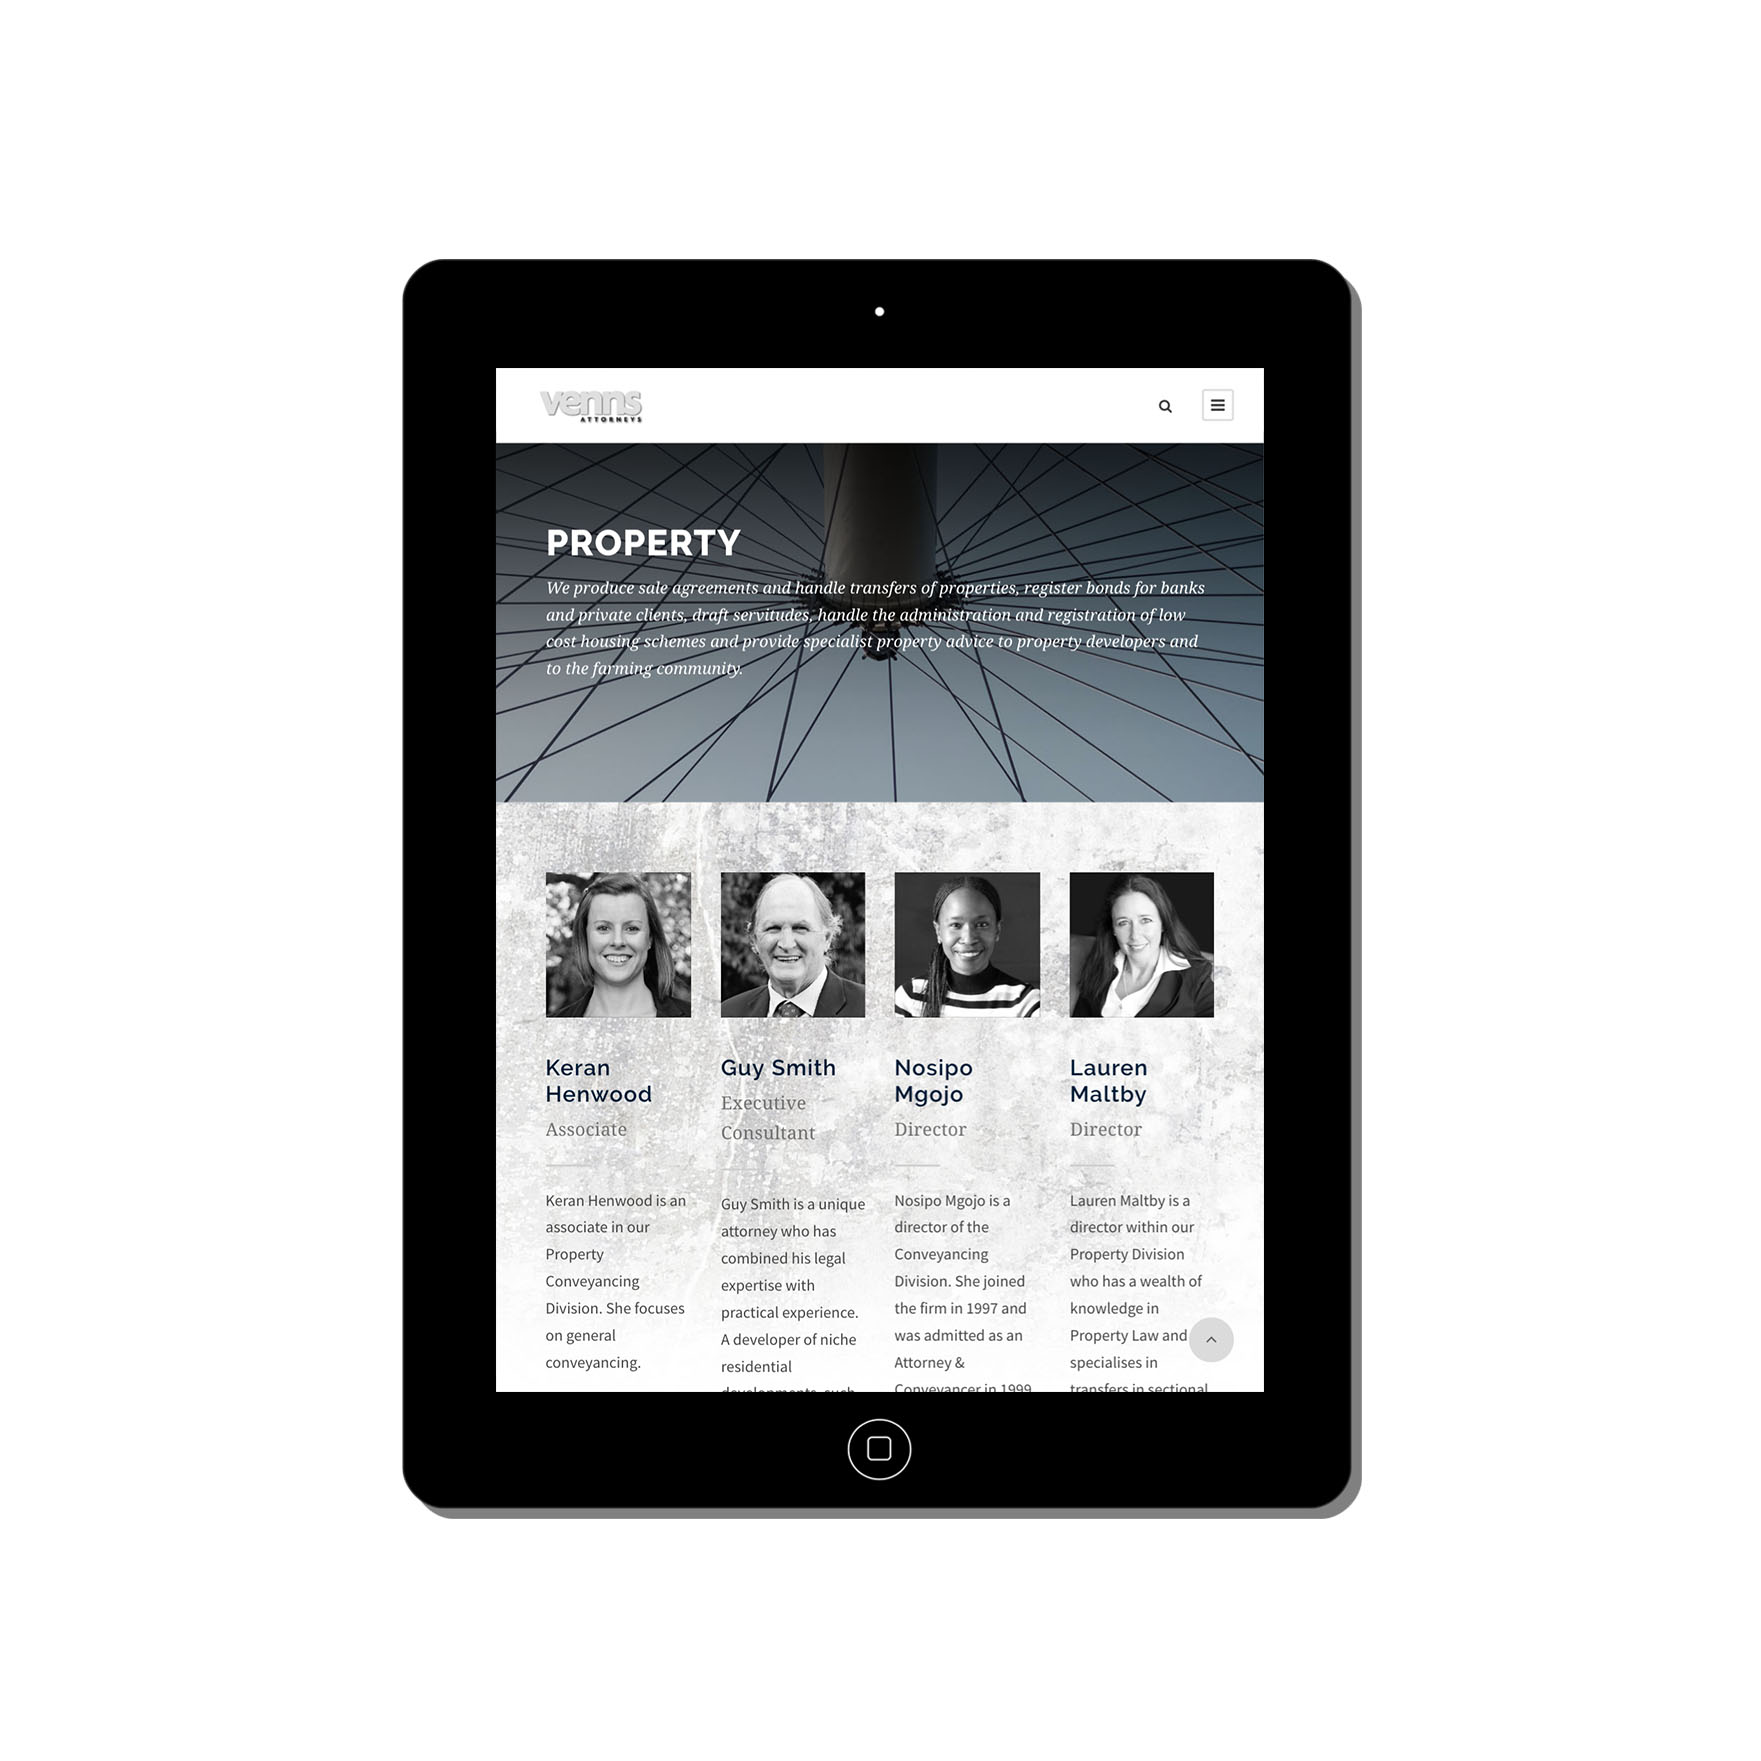 venns-web-design-portfolio-webdoor-responsive-web-design-agency-hillcrest-kwazulu-natal-tablet